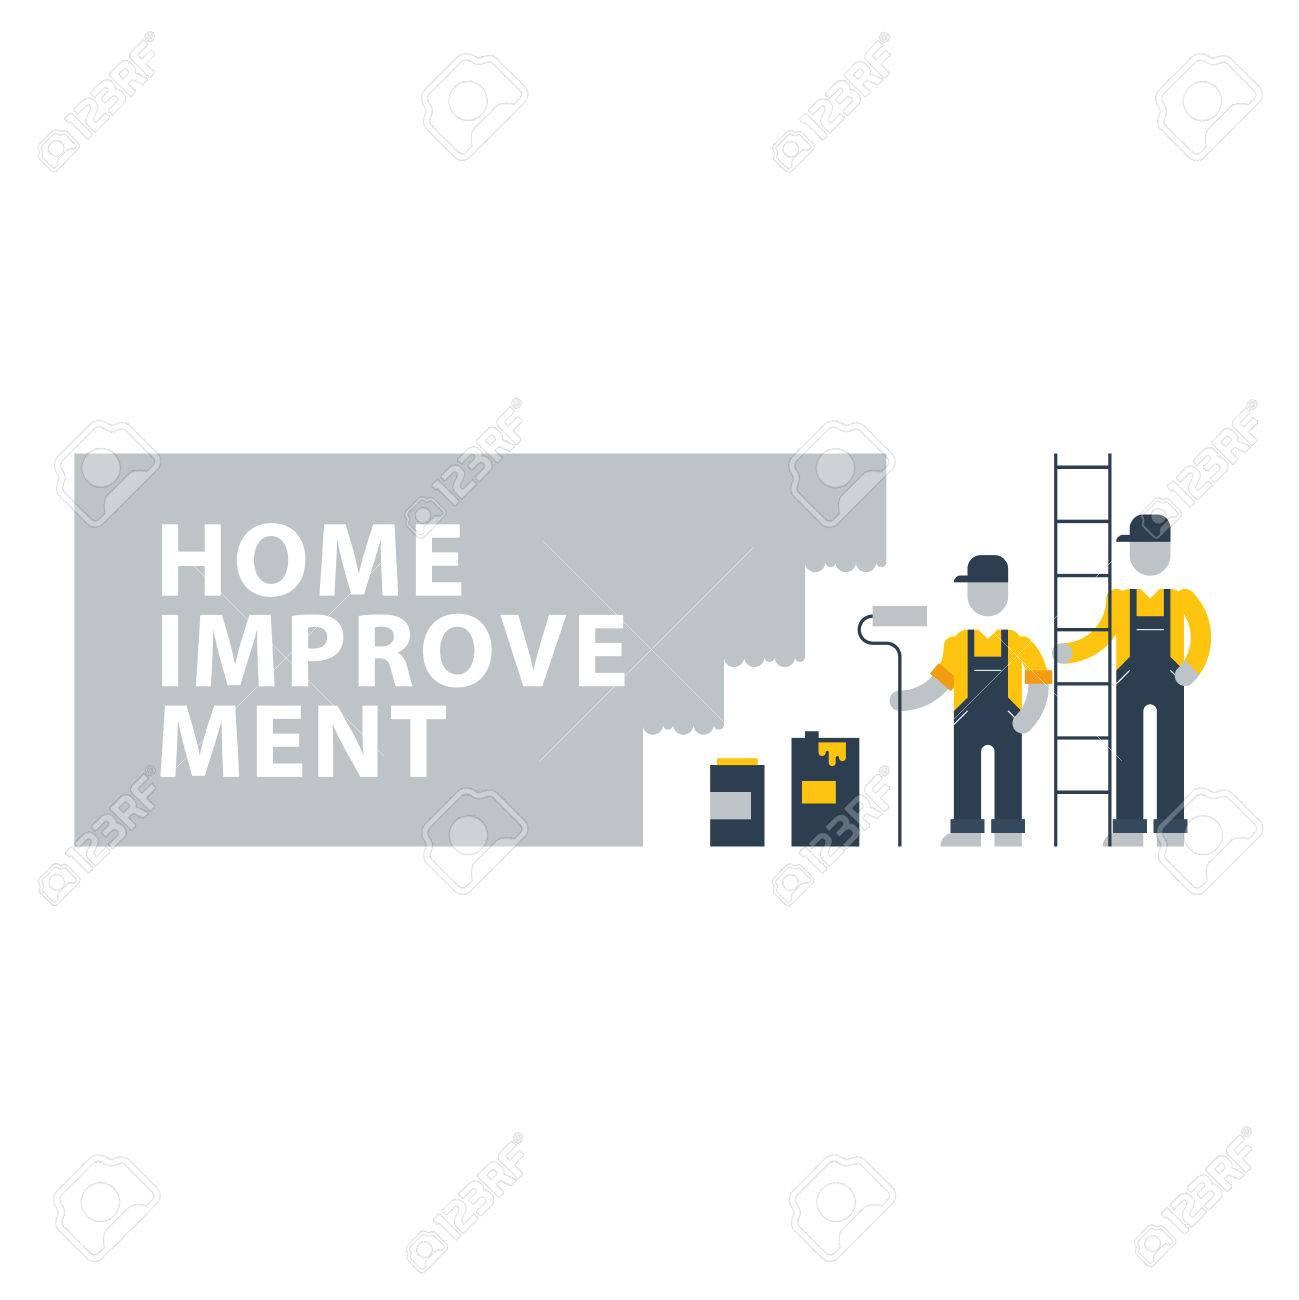 Home improvement services - 53208937